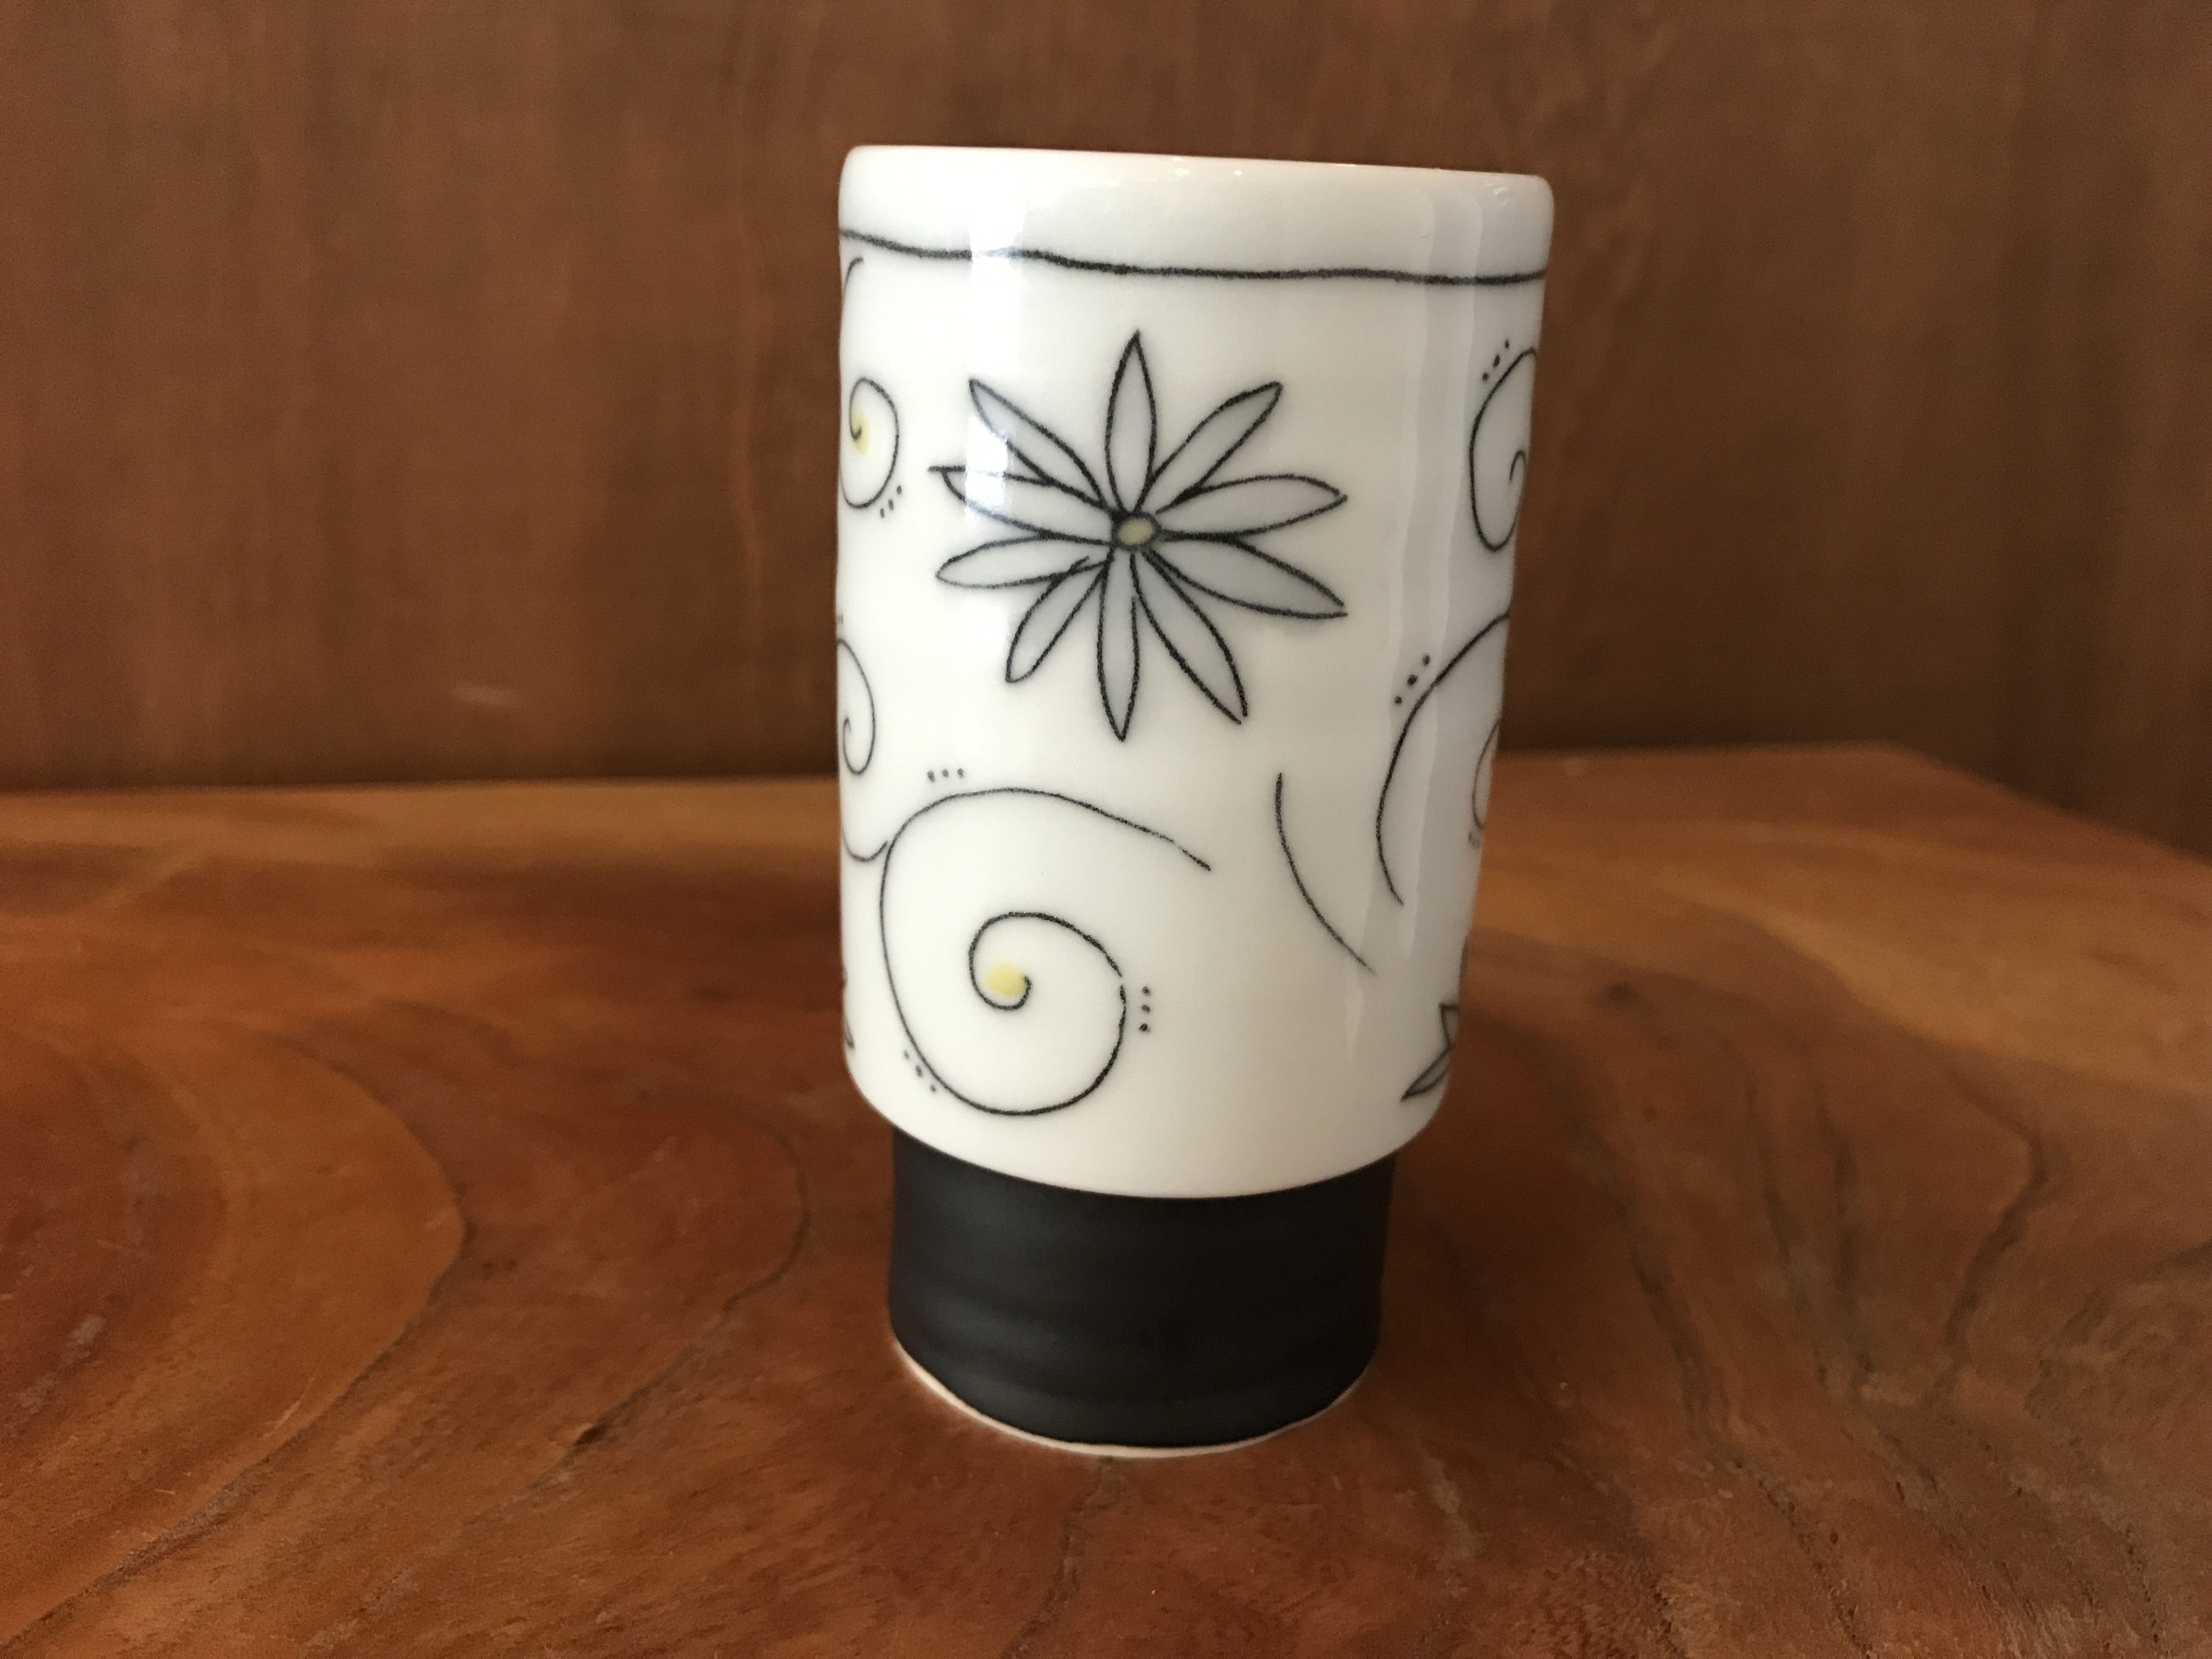 砥部焼 陶彩窯 象嵌の湯呑み